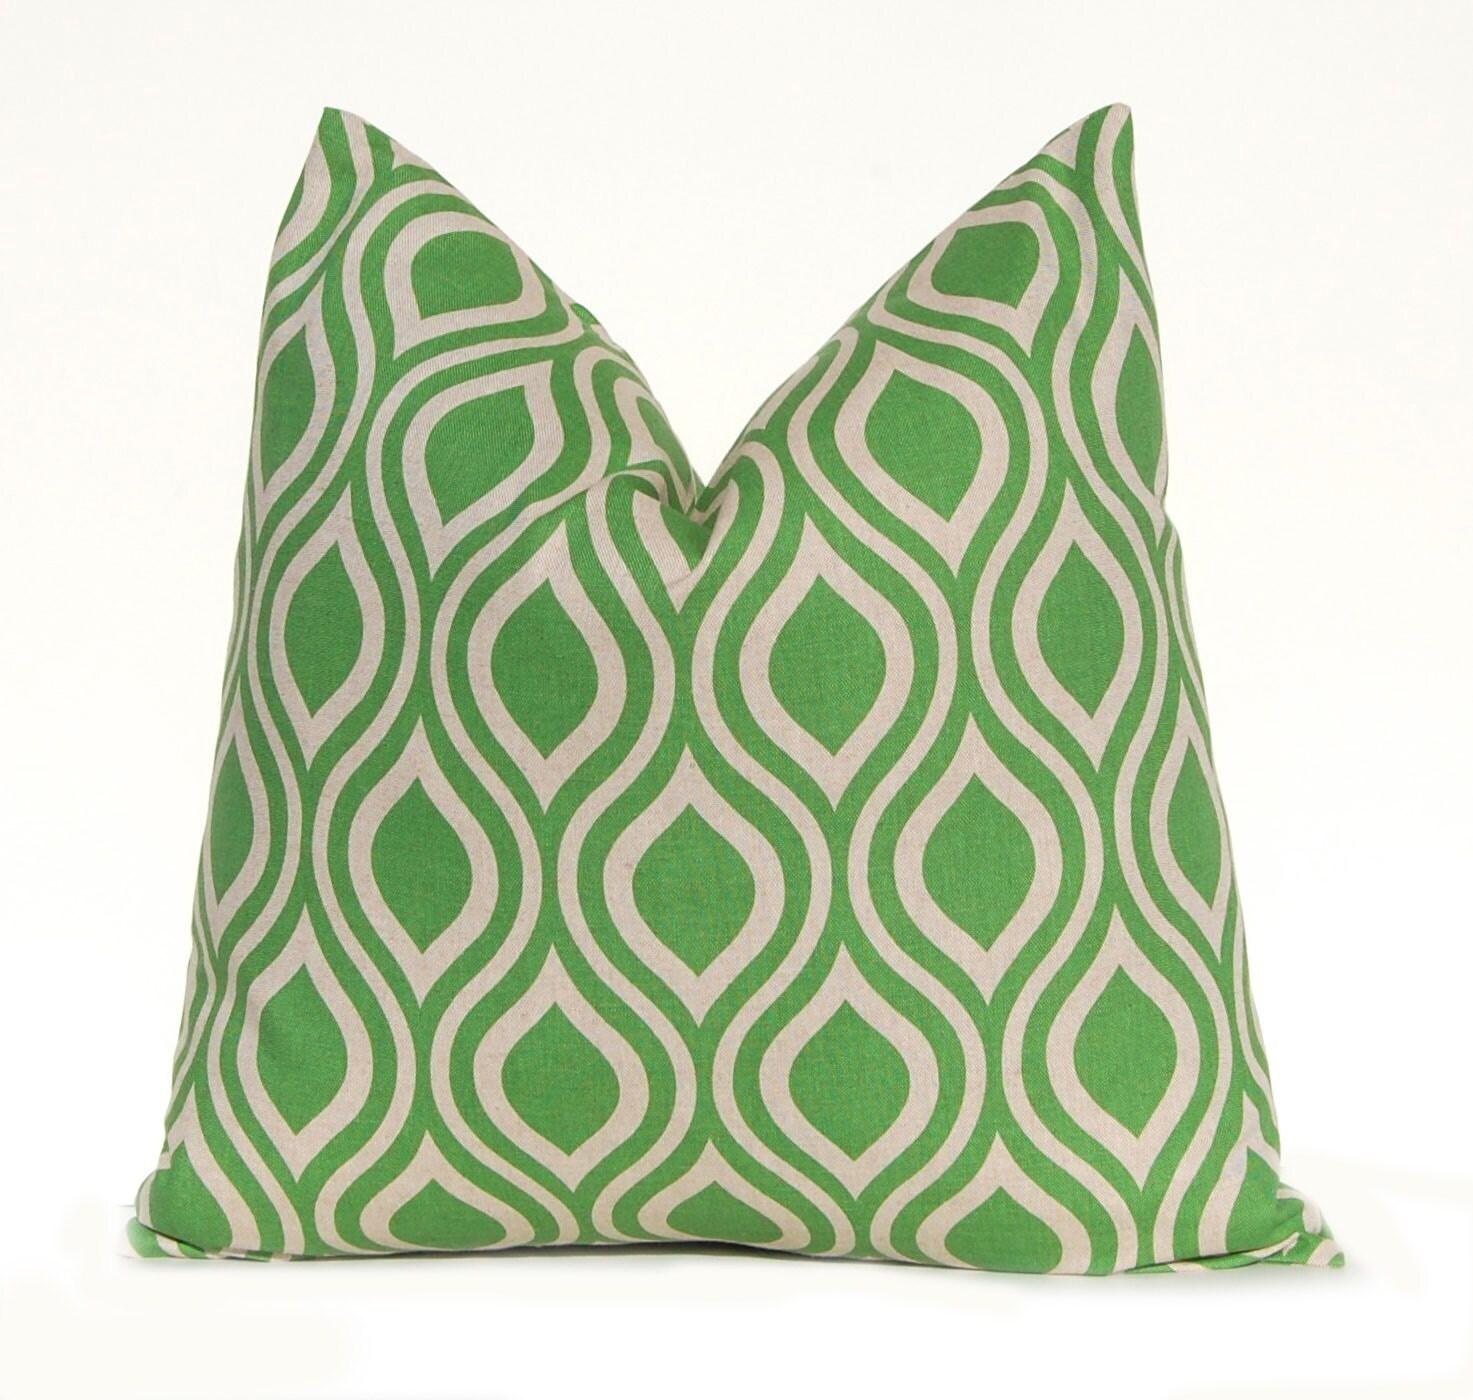 Green Pillow Covers 19 x 19 Green Cushions Throw Pillow